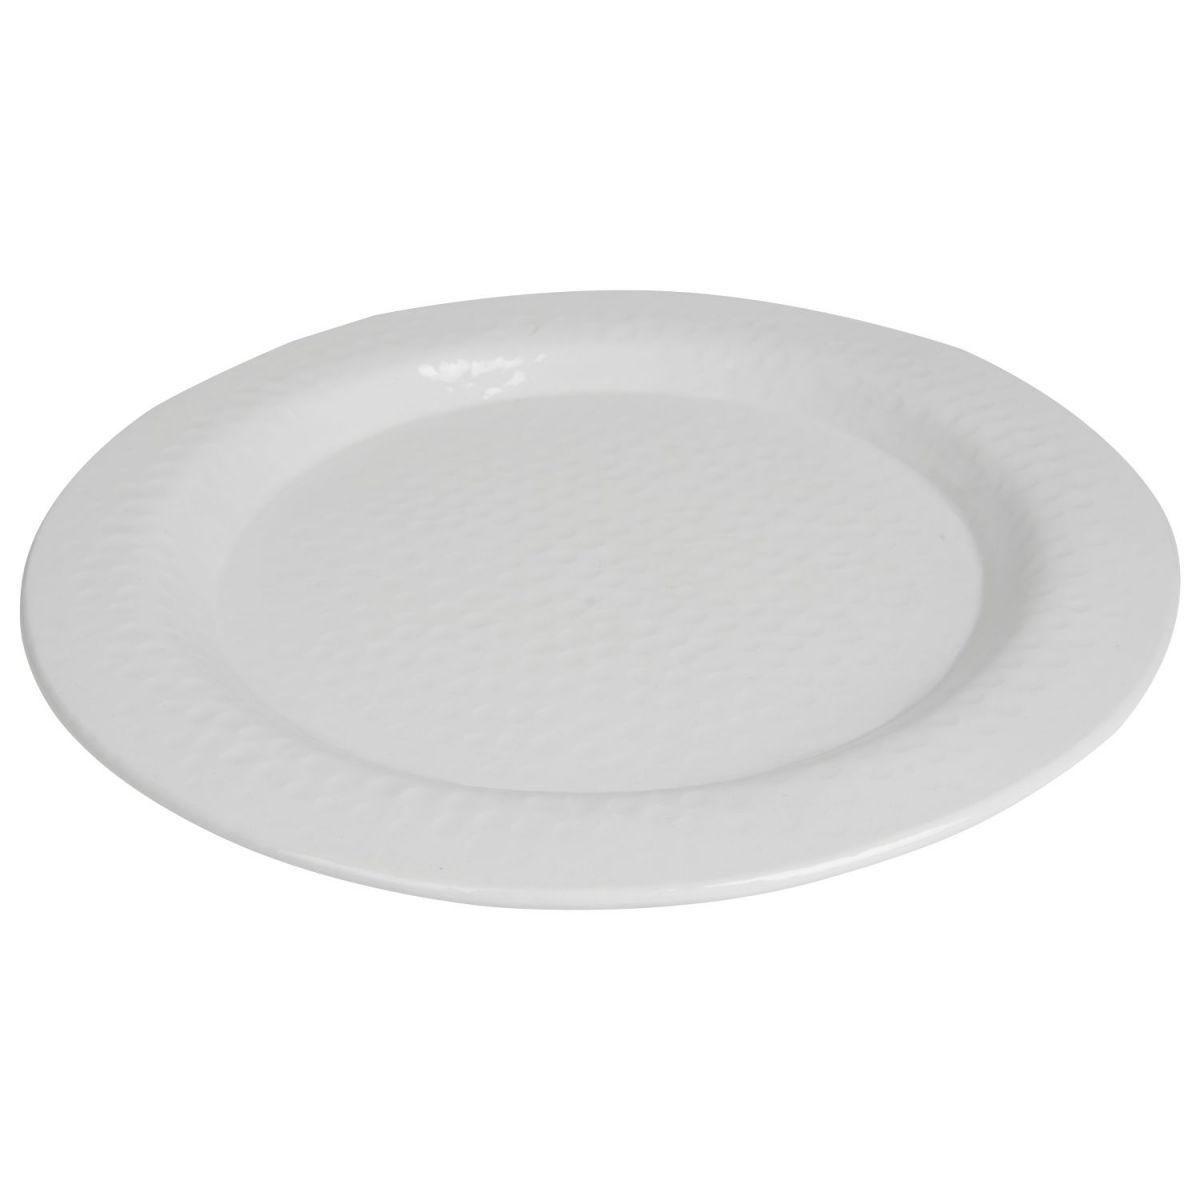 bord rond gehamerd wit 30cm